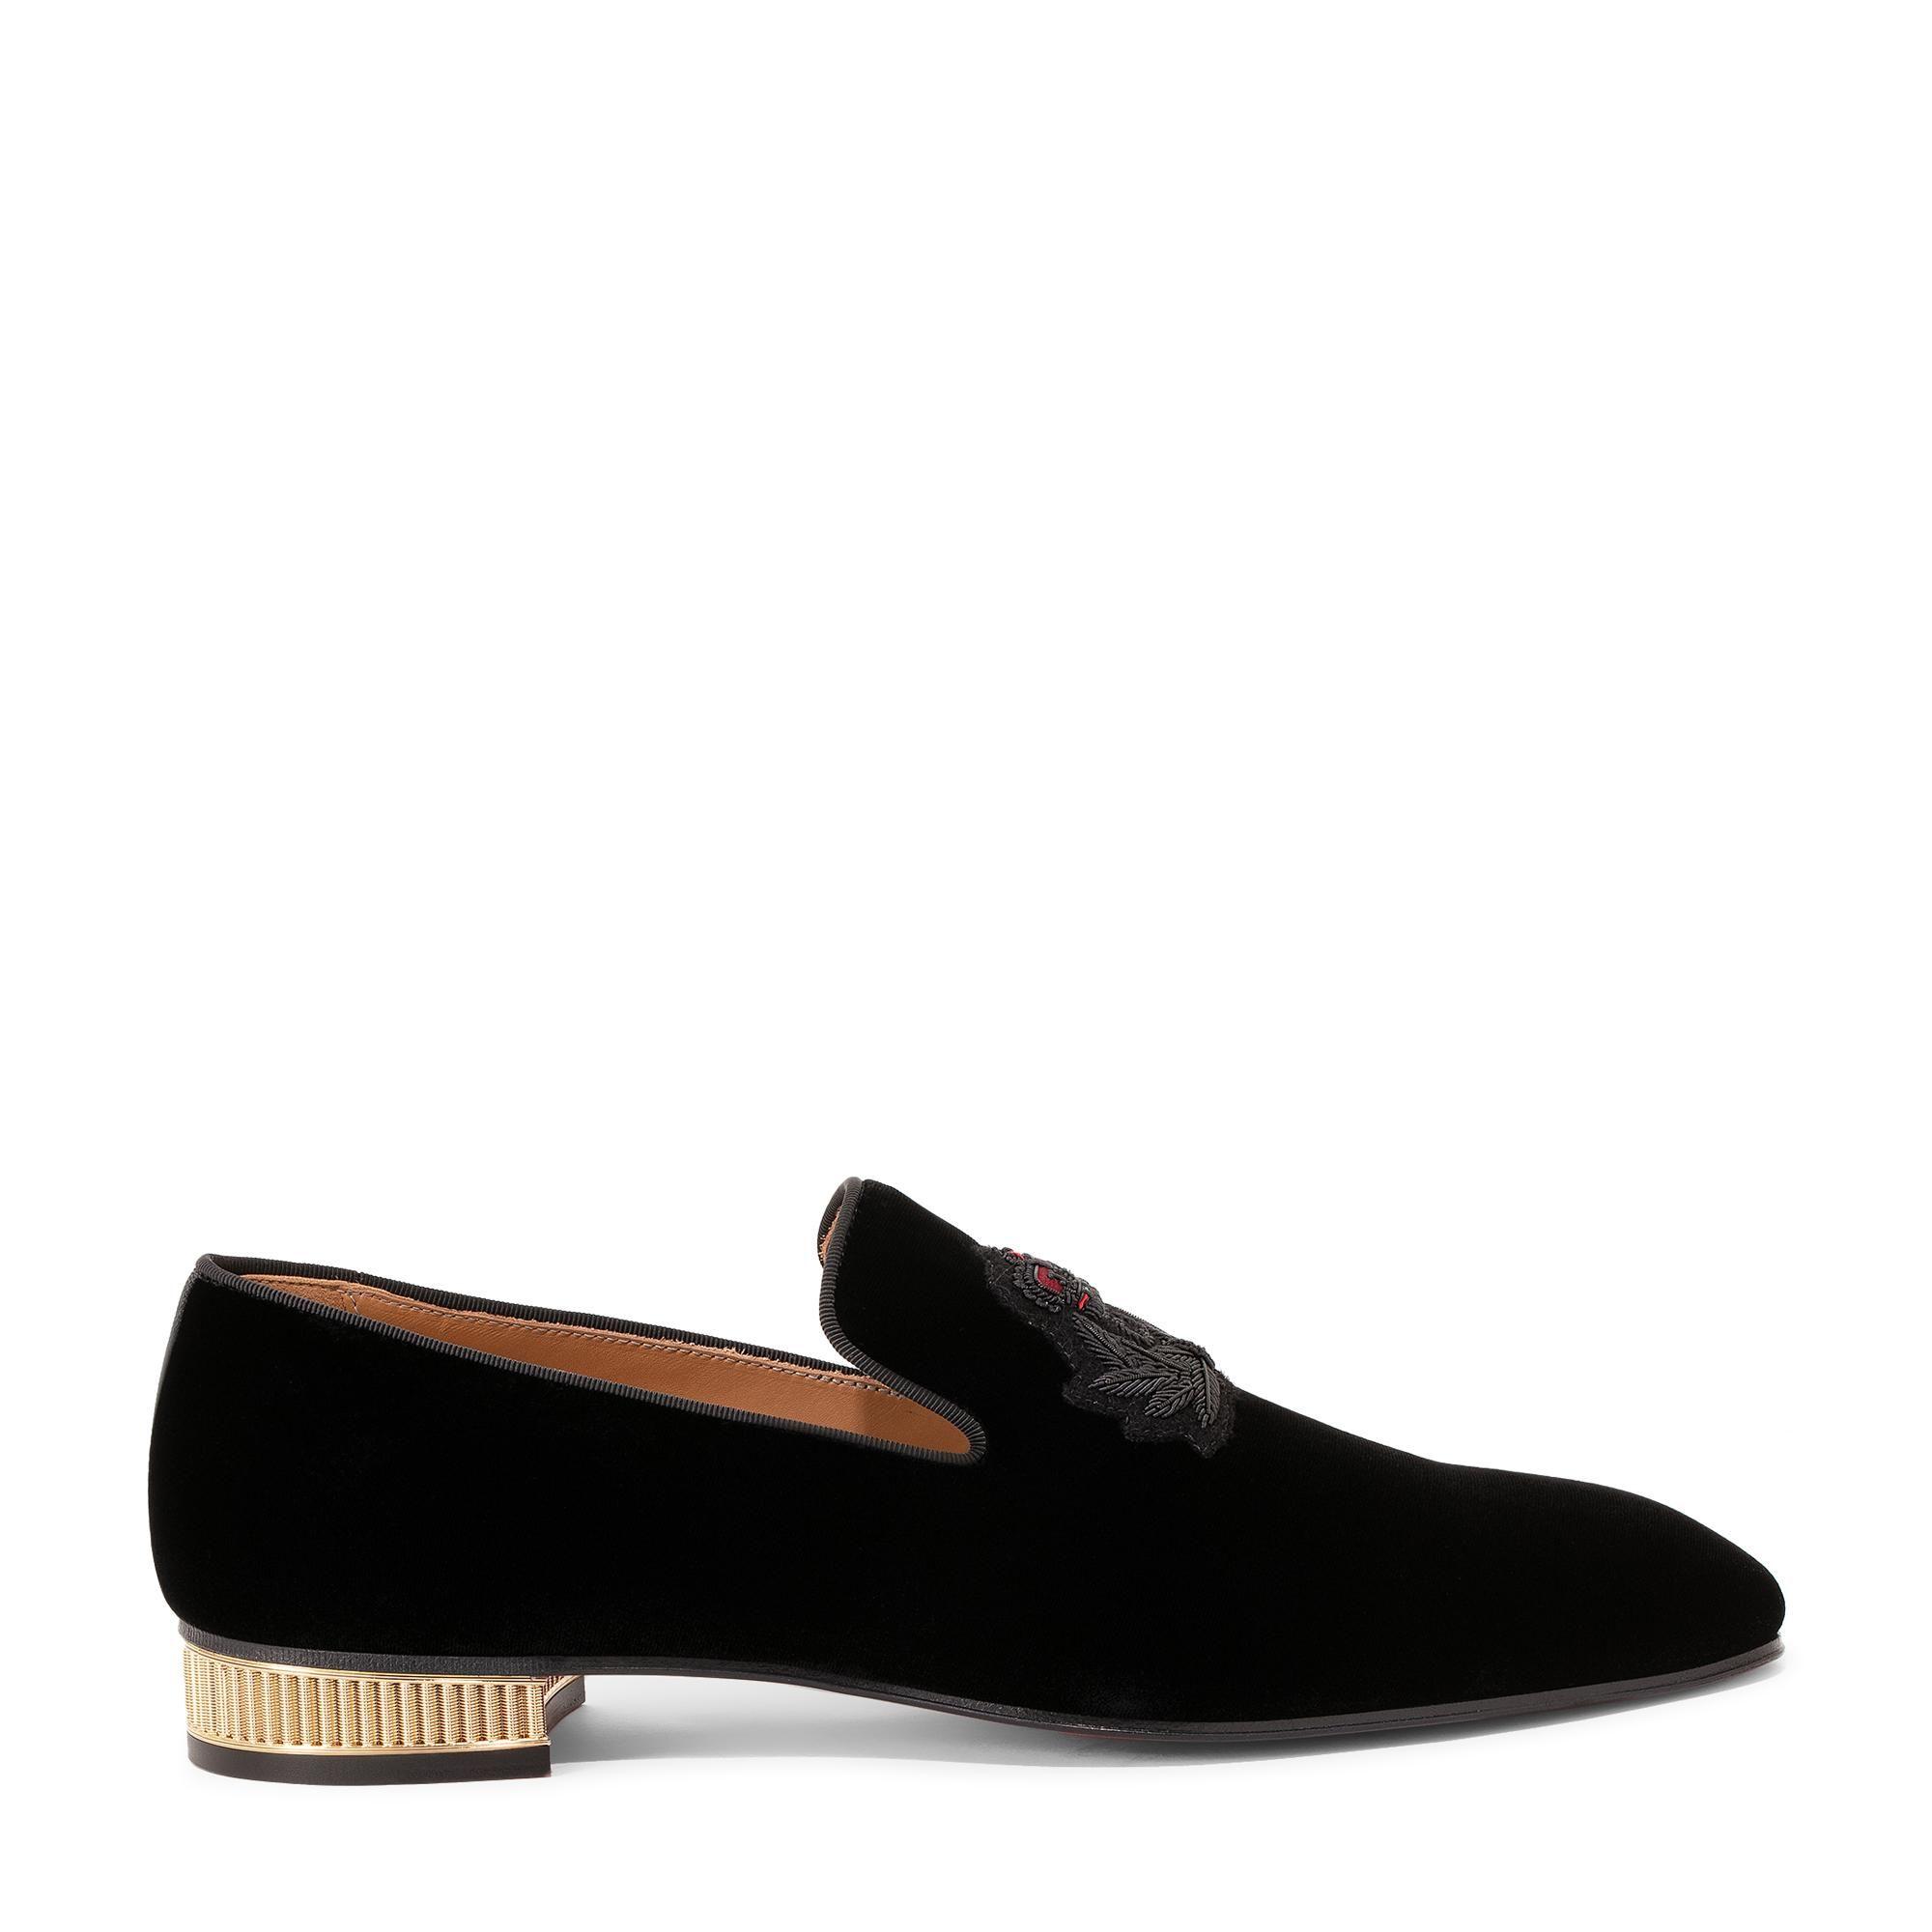 Captain Colonnaki moccasin loafers